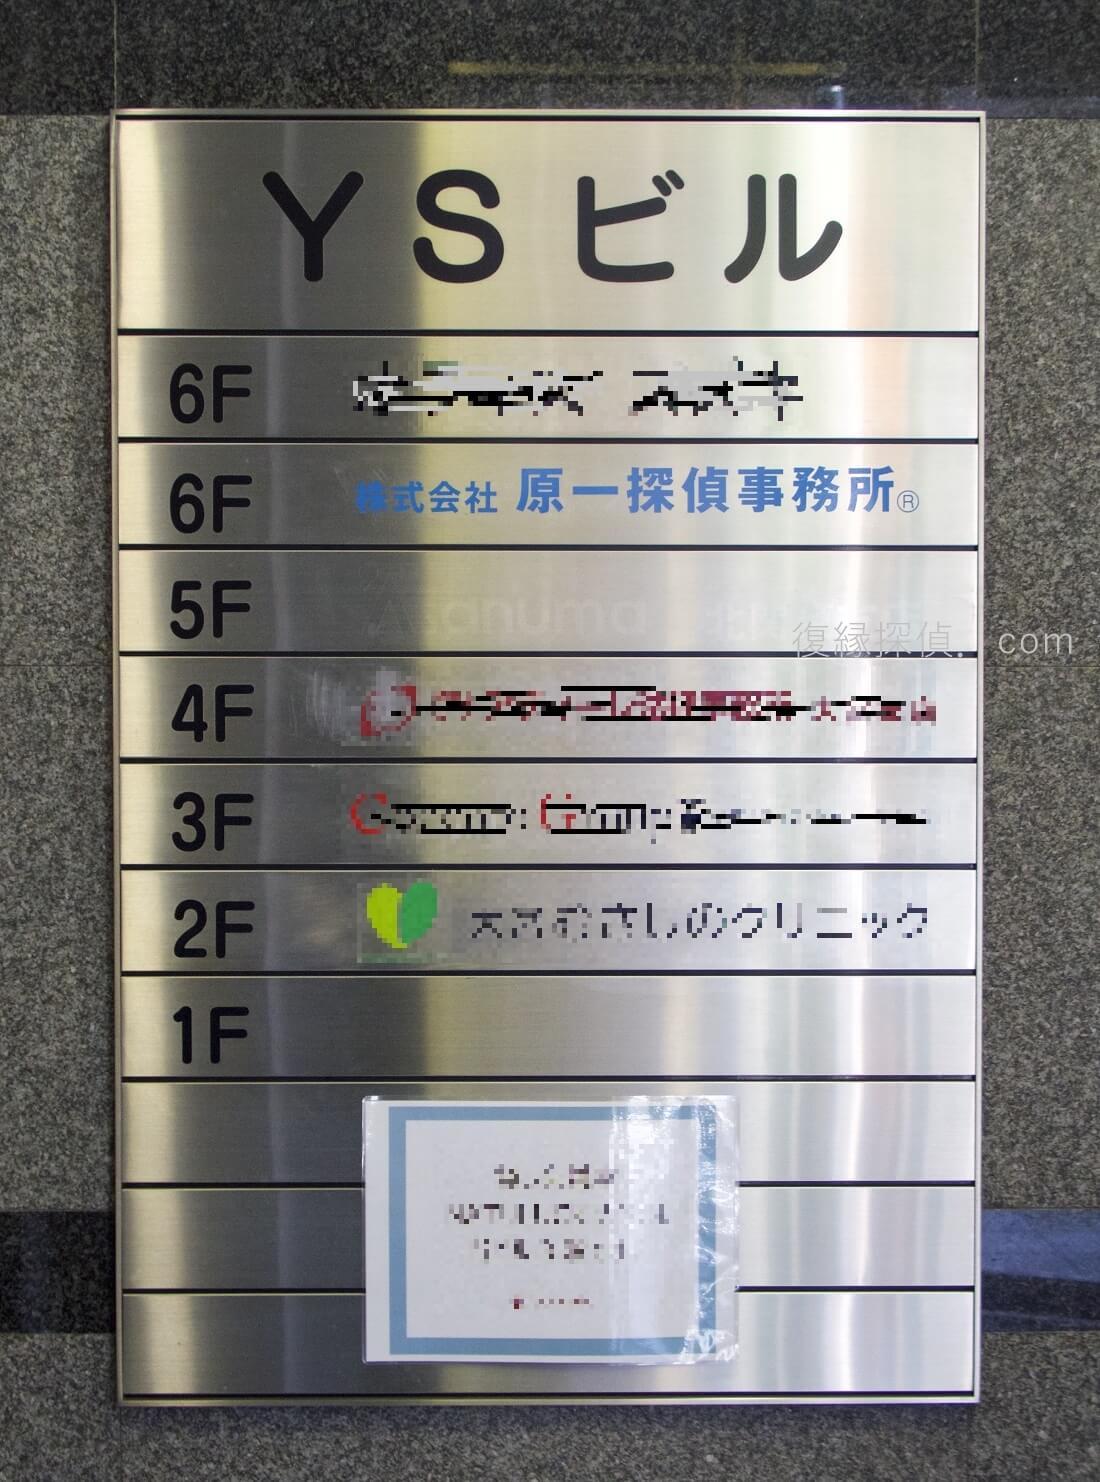 原一探偵事務所の大宮拠点・埼玉の口コミ・評判